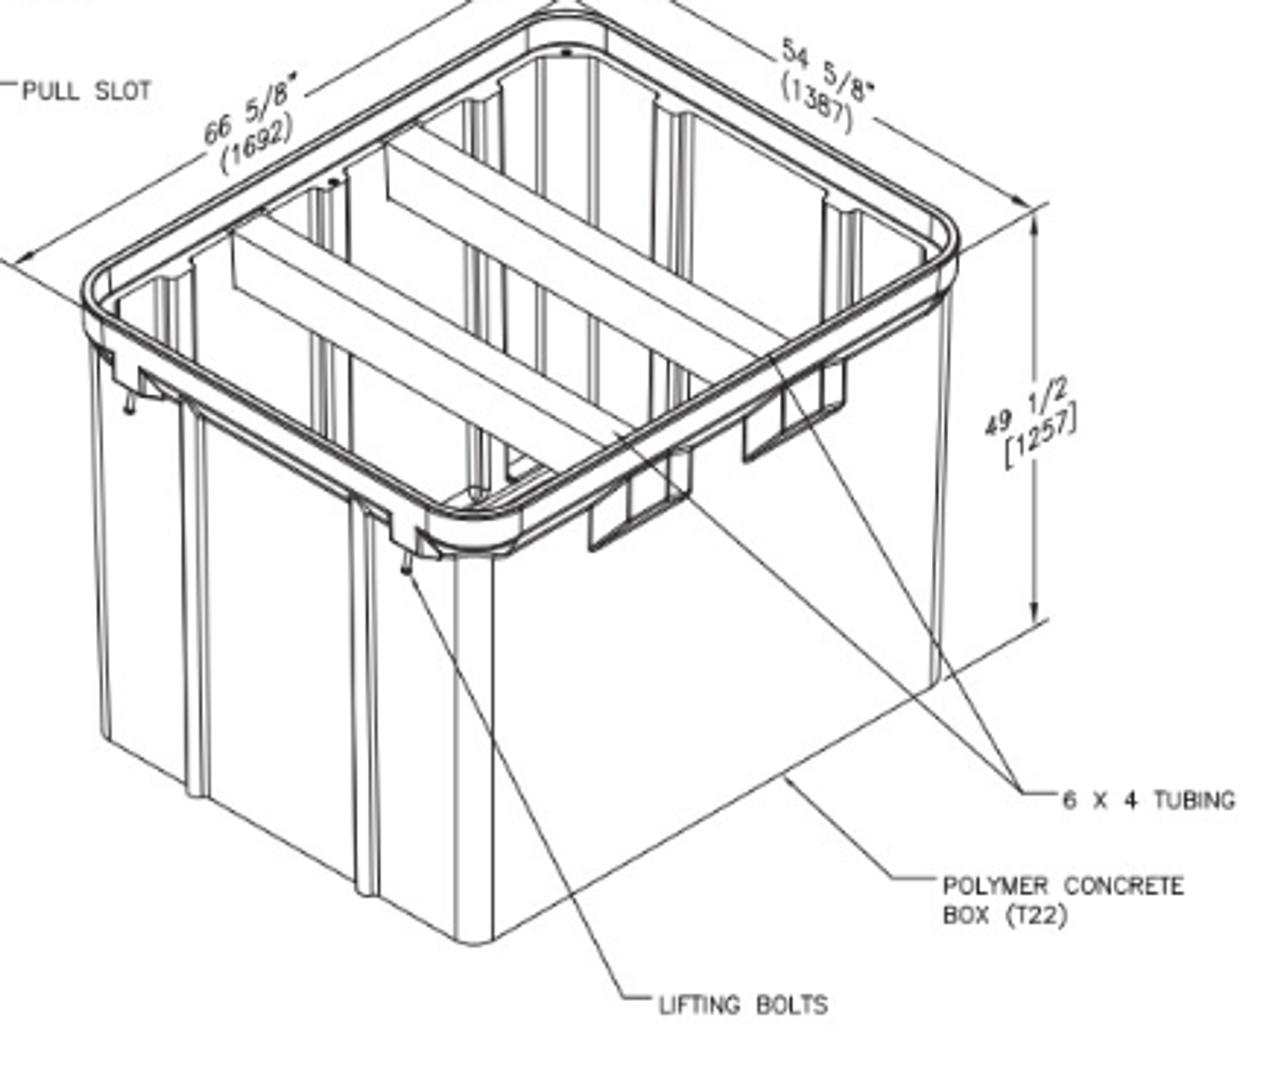 PG4860BA48 - Quazite Box 48 X 60 X 48 - ANSI Tier 22